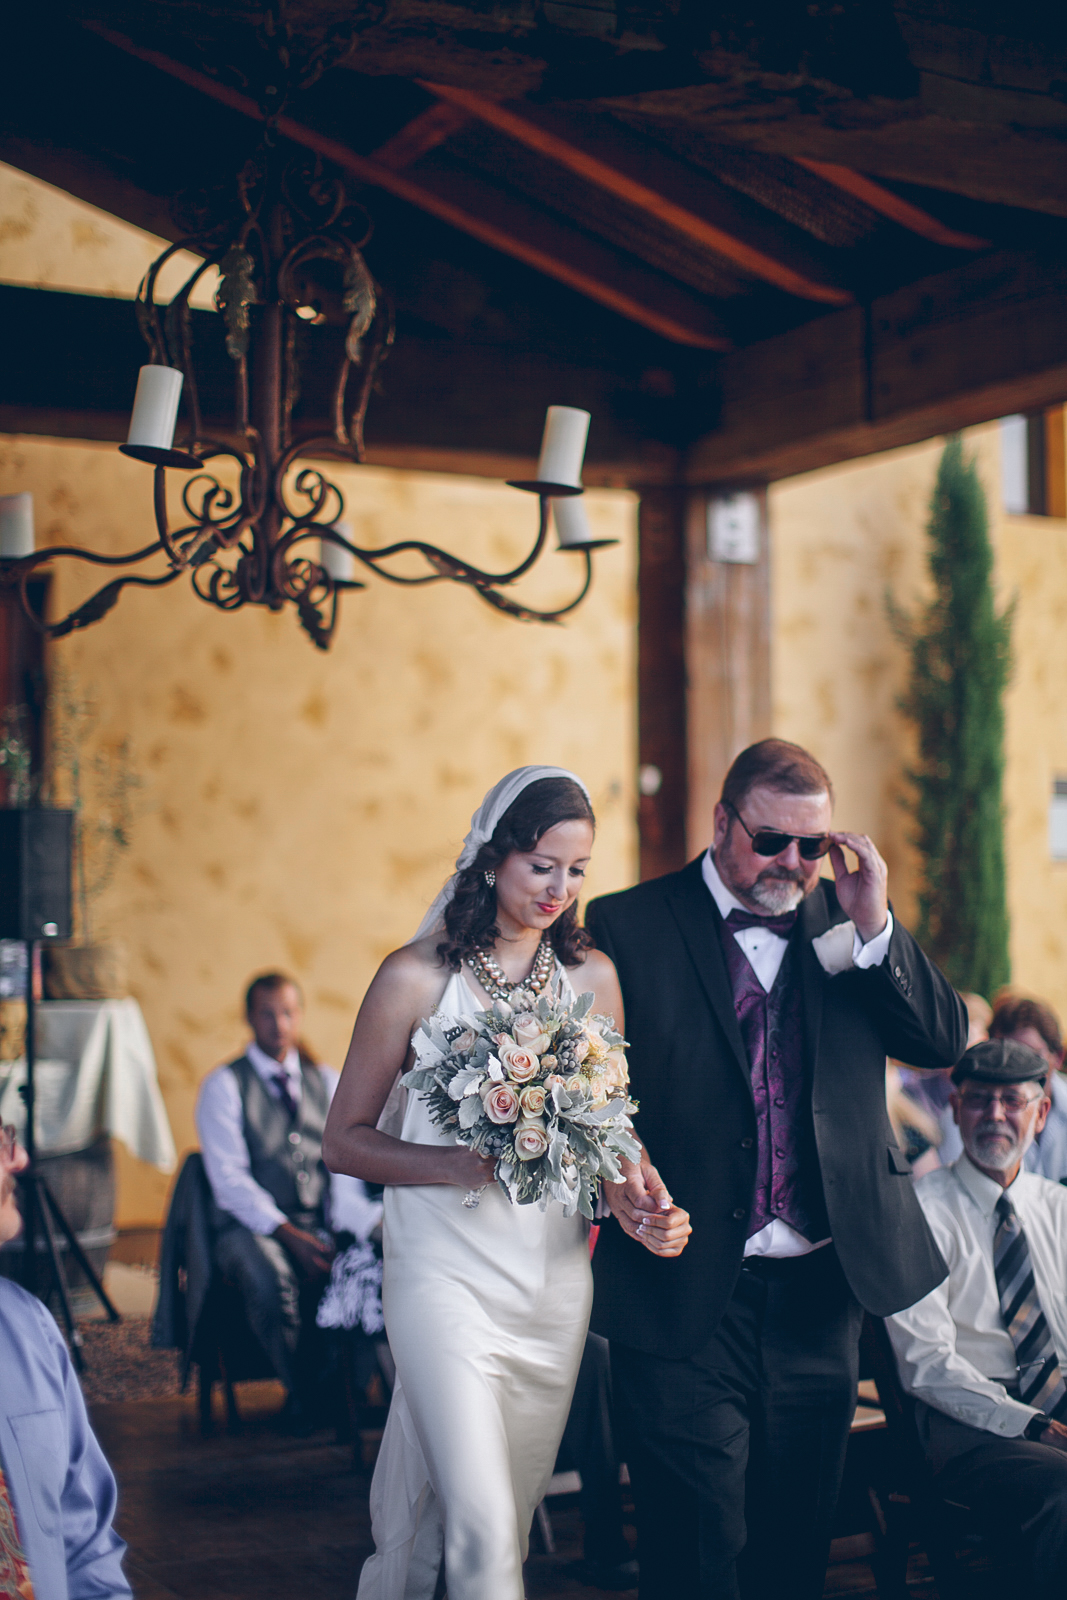 miraflores_winery_wedding_photography_ian_melissa_ebony_siovhan_bokeh_photography_23.jpg